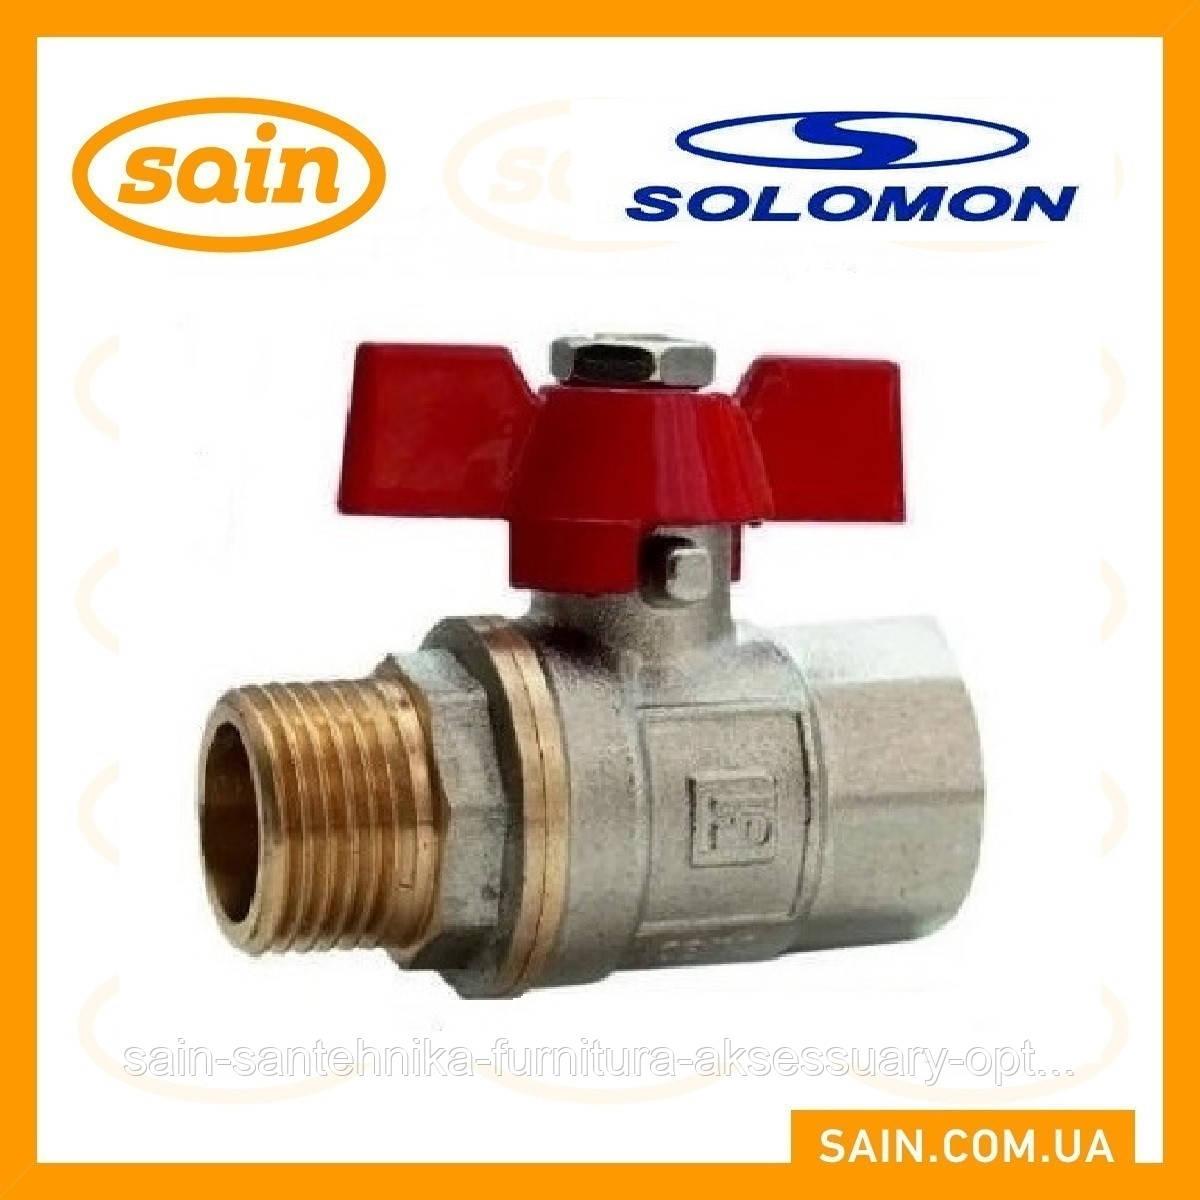 Кран 1 PN 40 Solomon